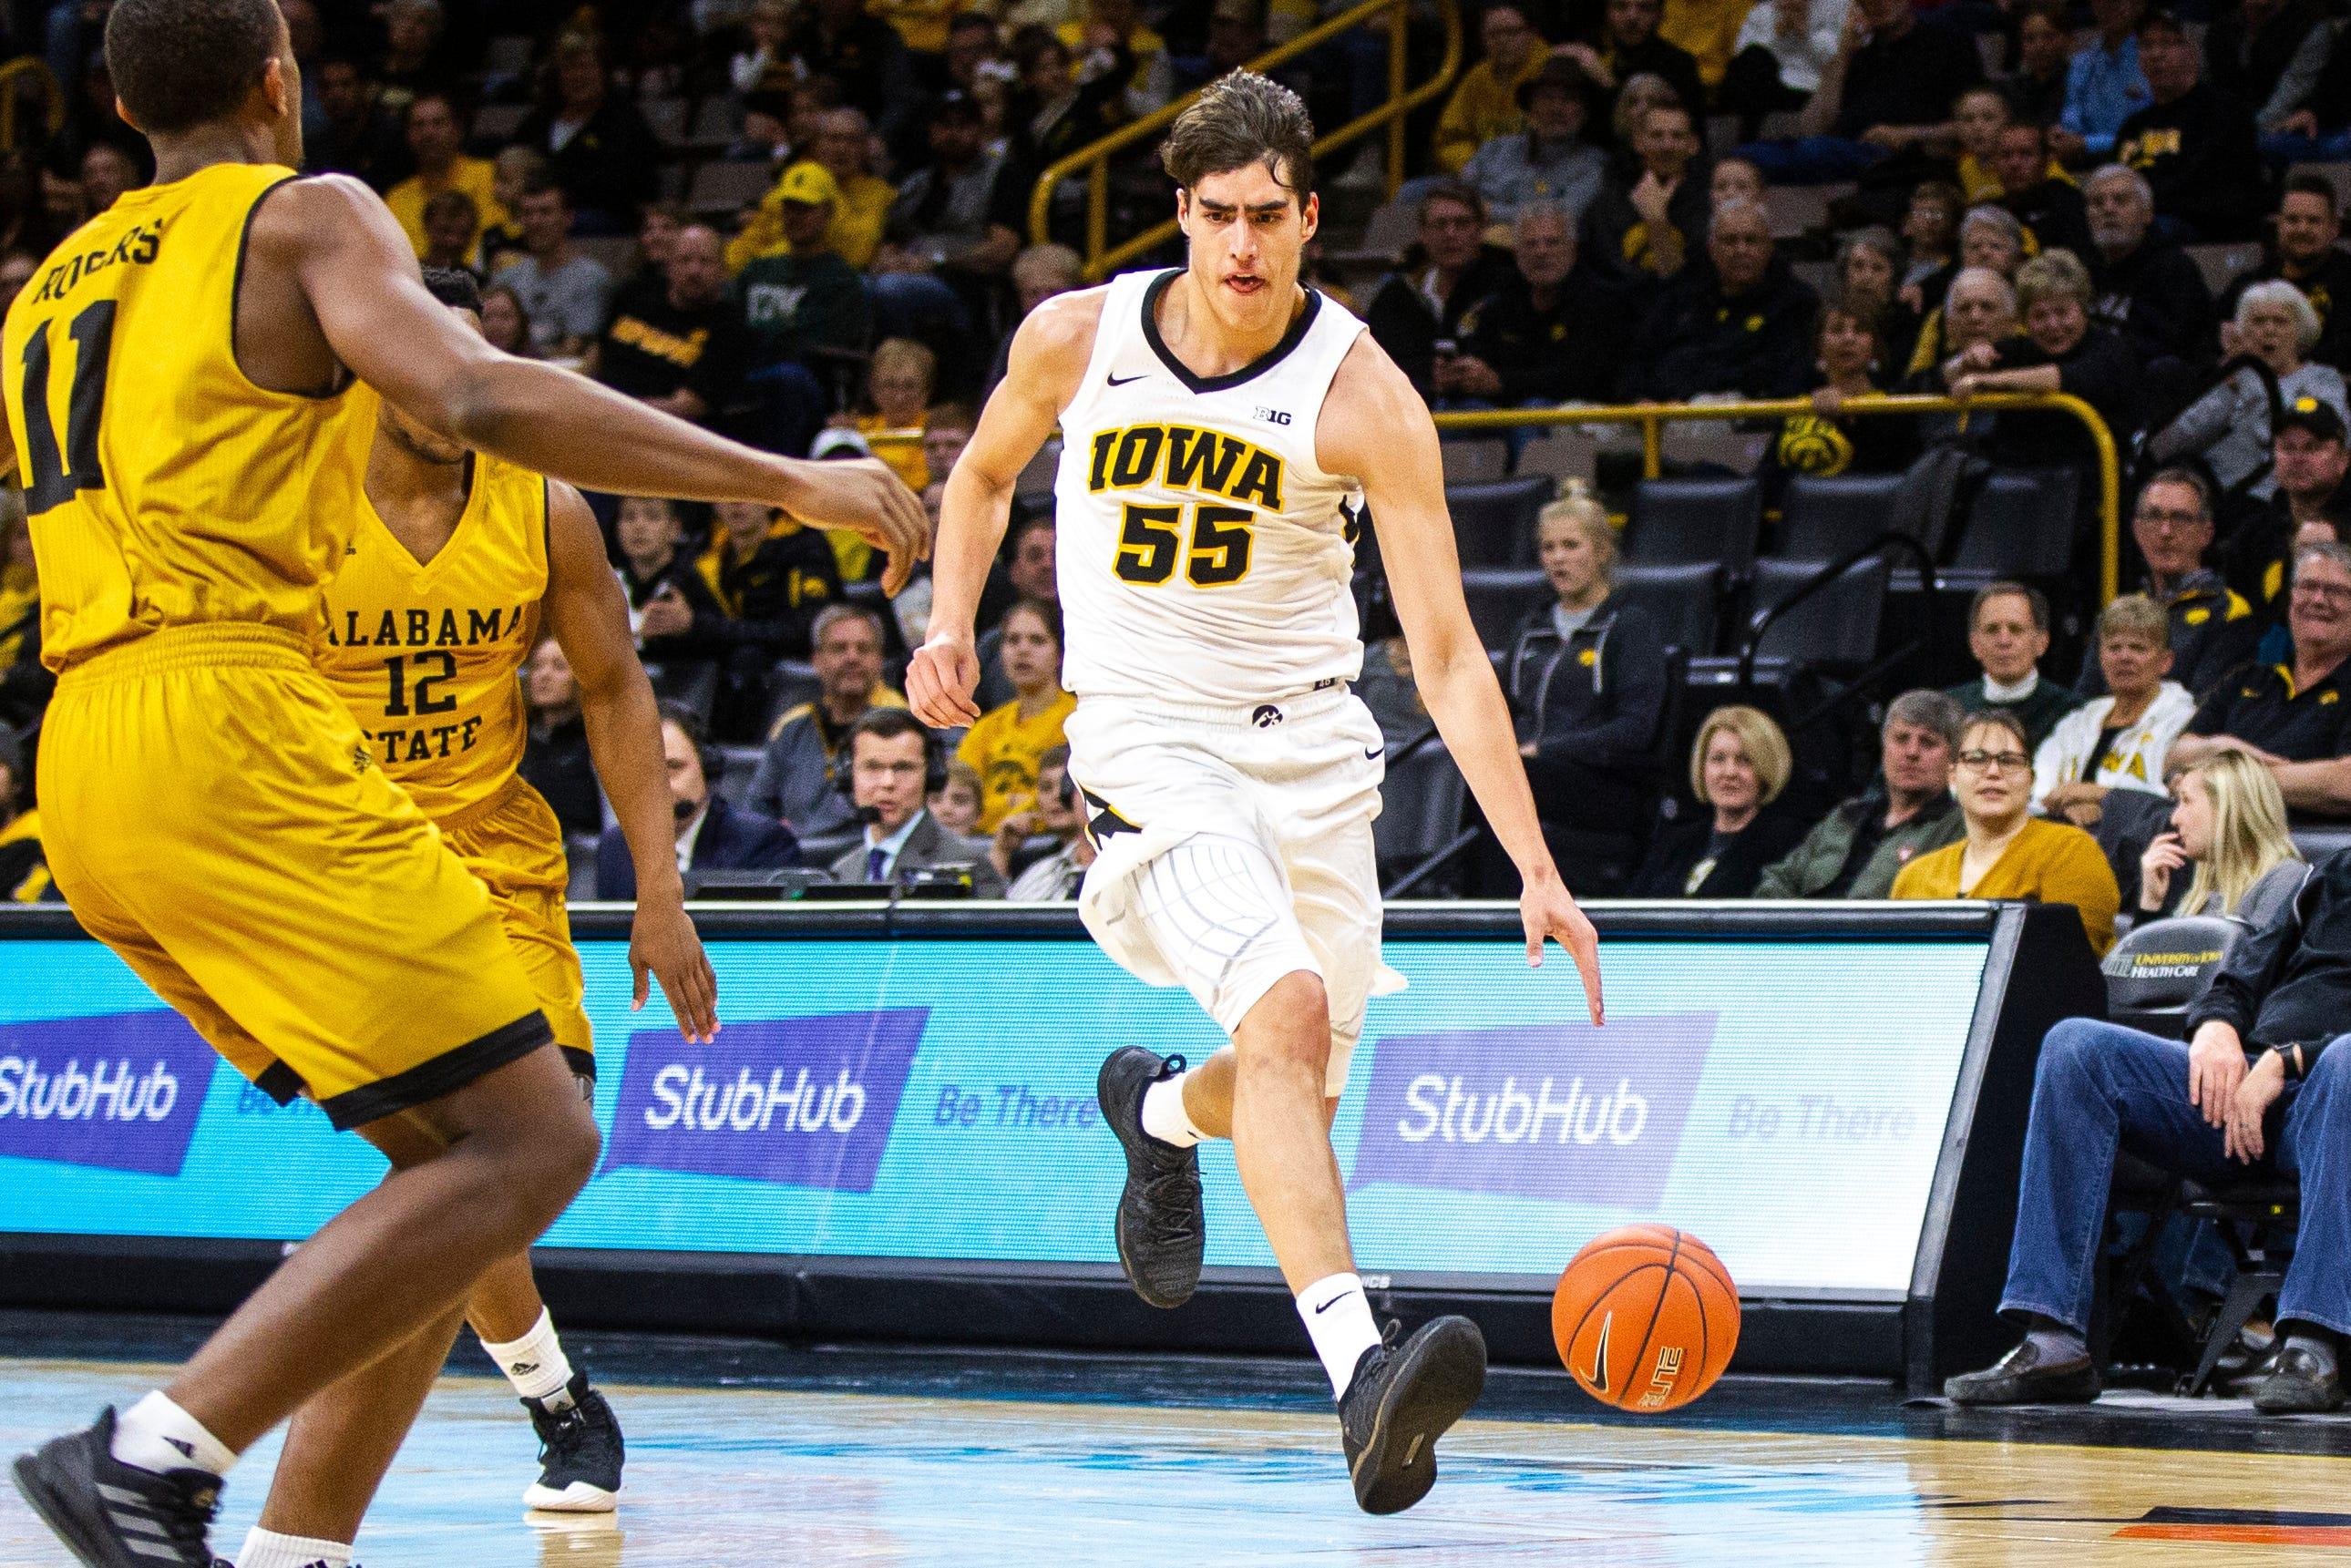 iowa basketball: luka garza helps no. 15 hawkeyes to an unbeaten start